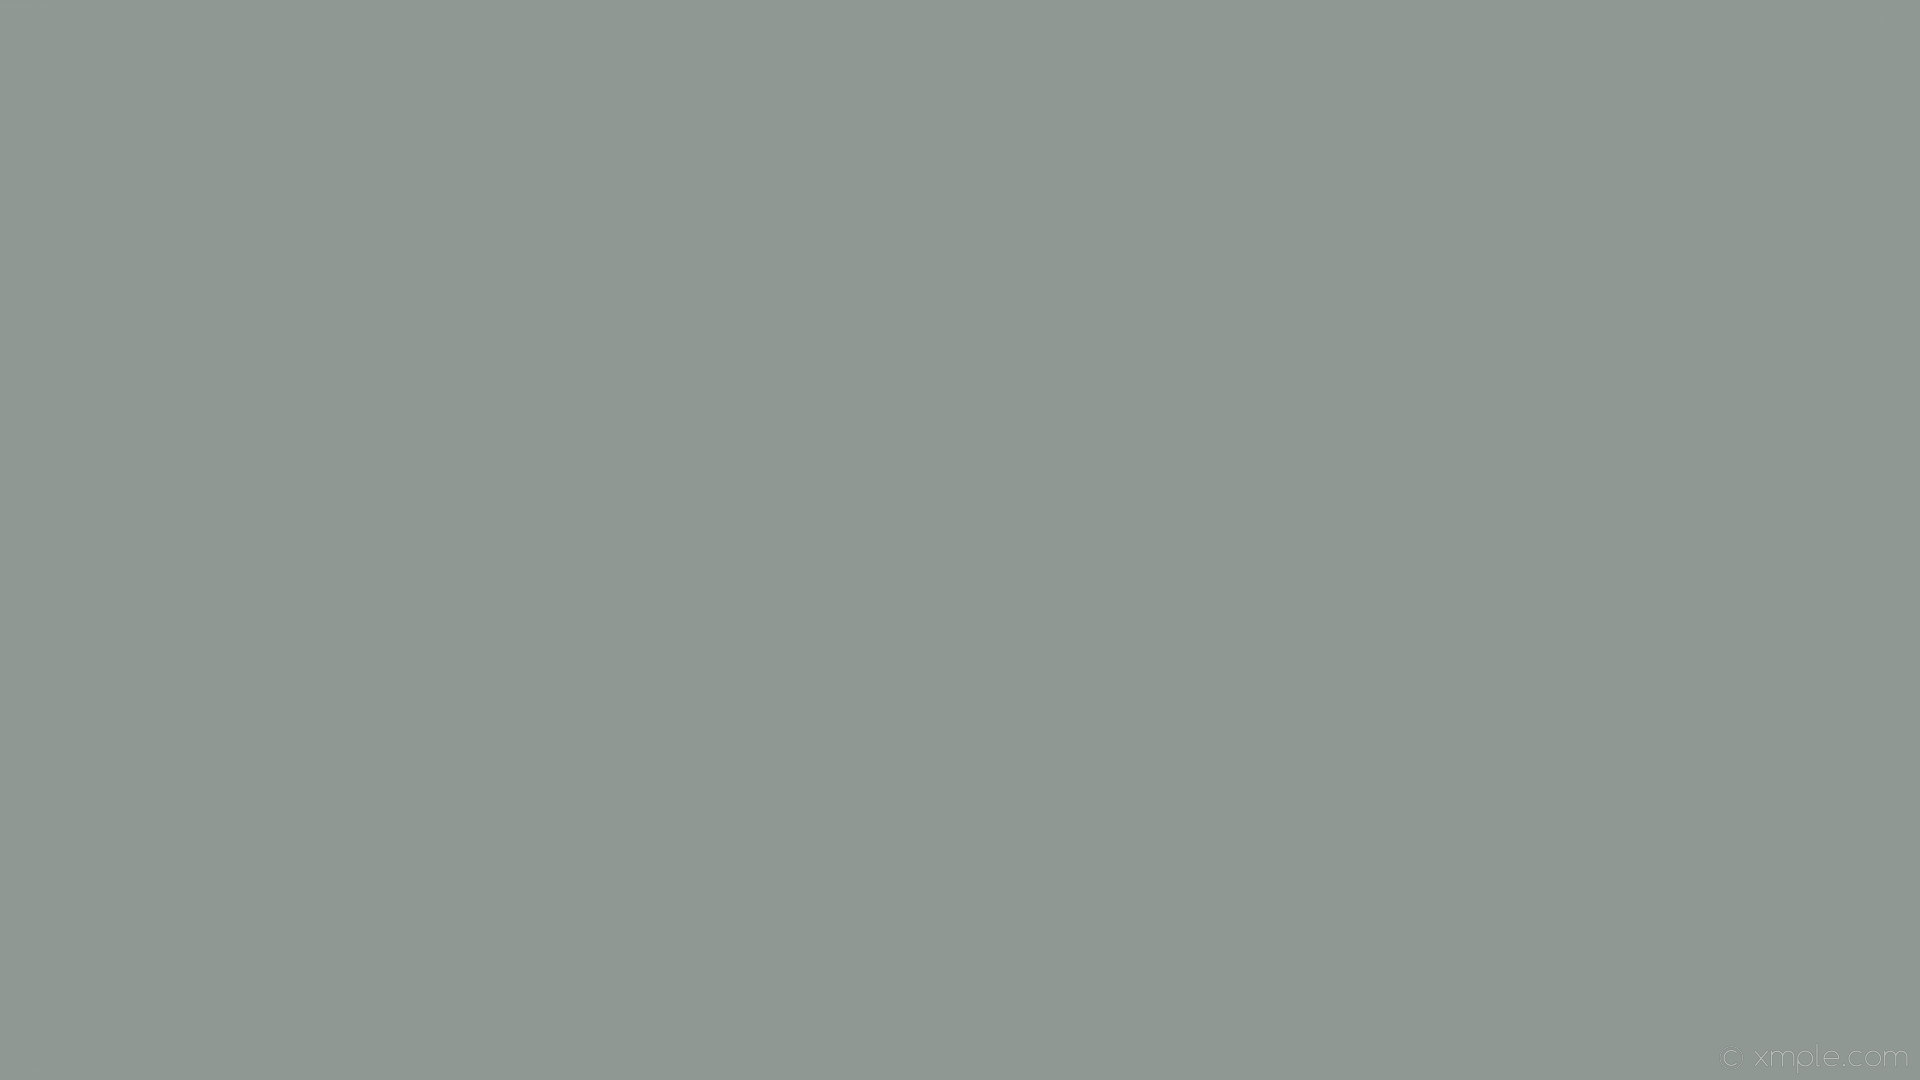 wallpaper one colour single solid color gray plain #909894